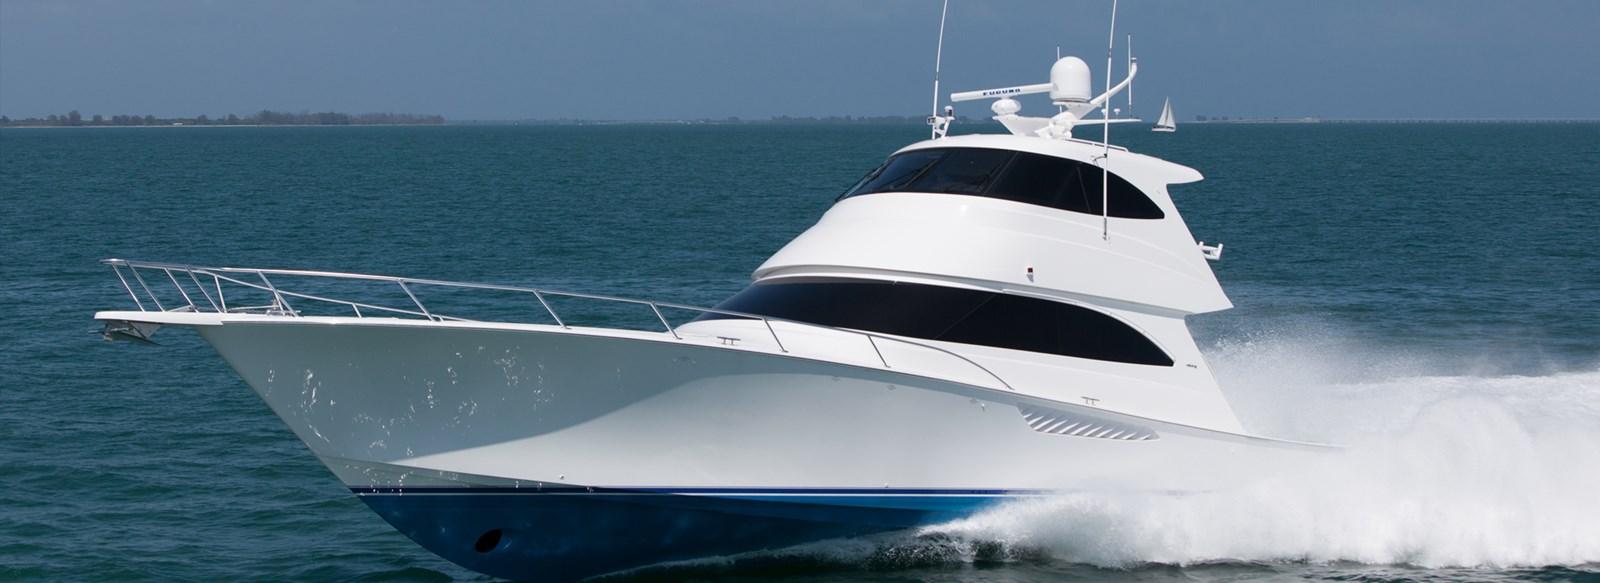 New Viking 66 Enclosed Bridge Yachts For Sale